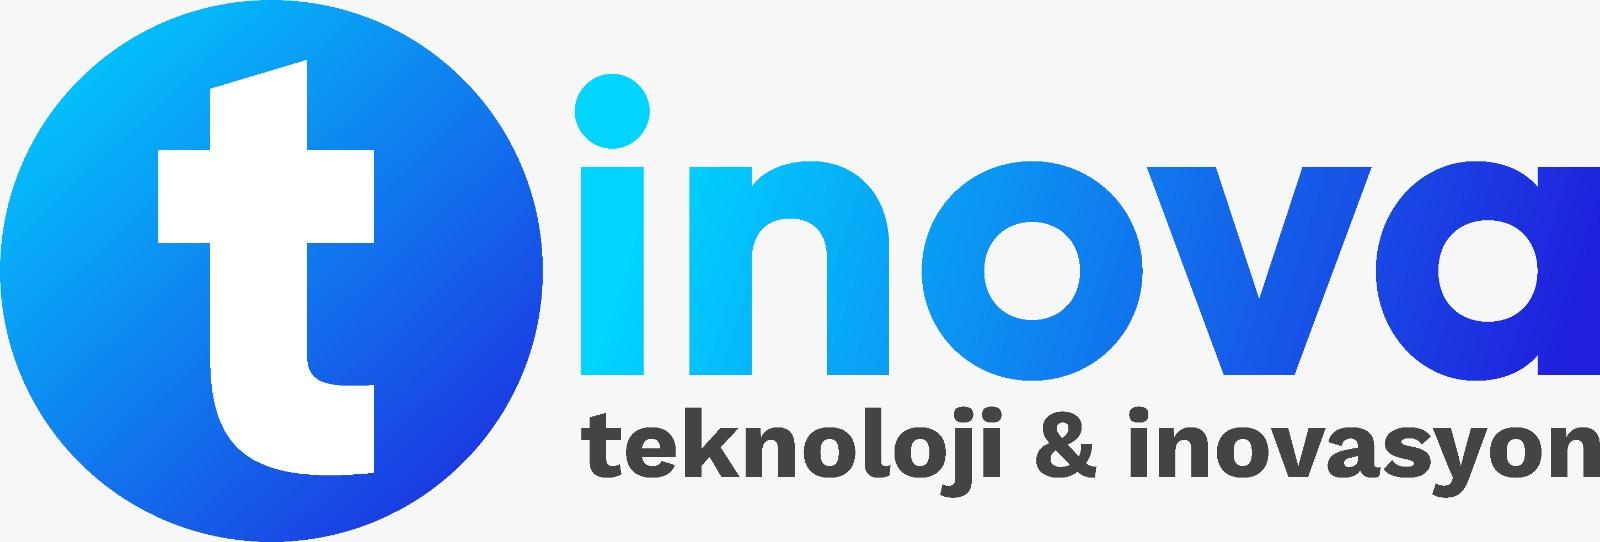 https://tedarikzinciri.org/wp-content/uploads/2020/09/Tinova_logo.jpeg